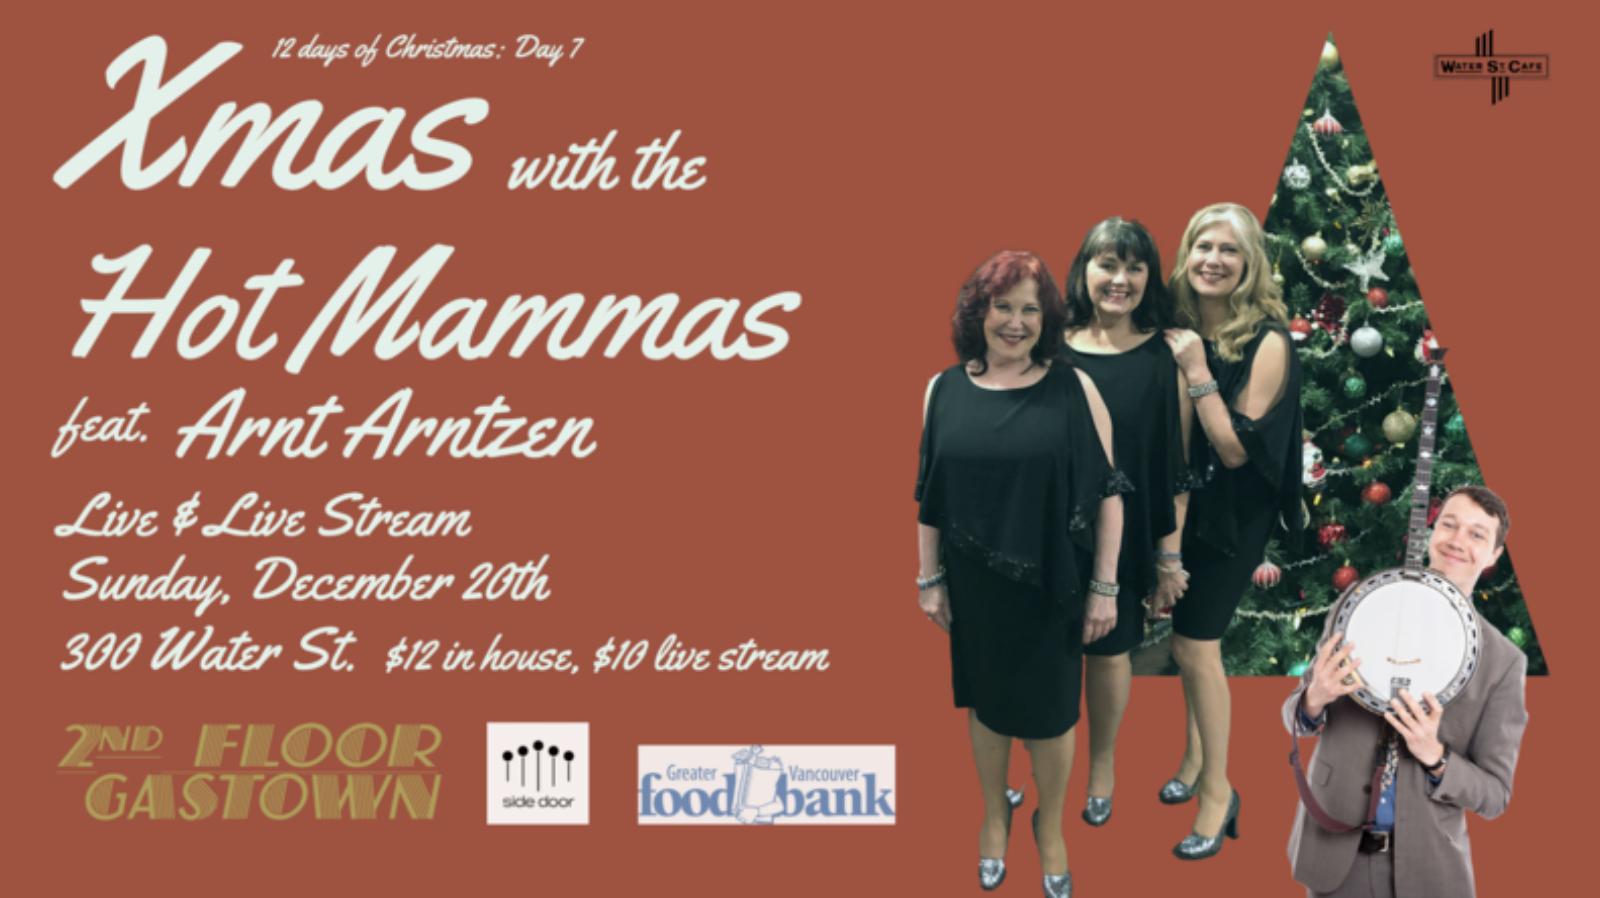 Xmas with the Hot Mamas.png